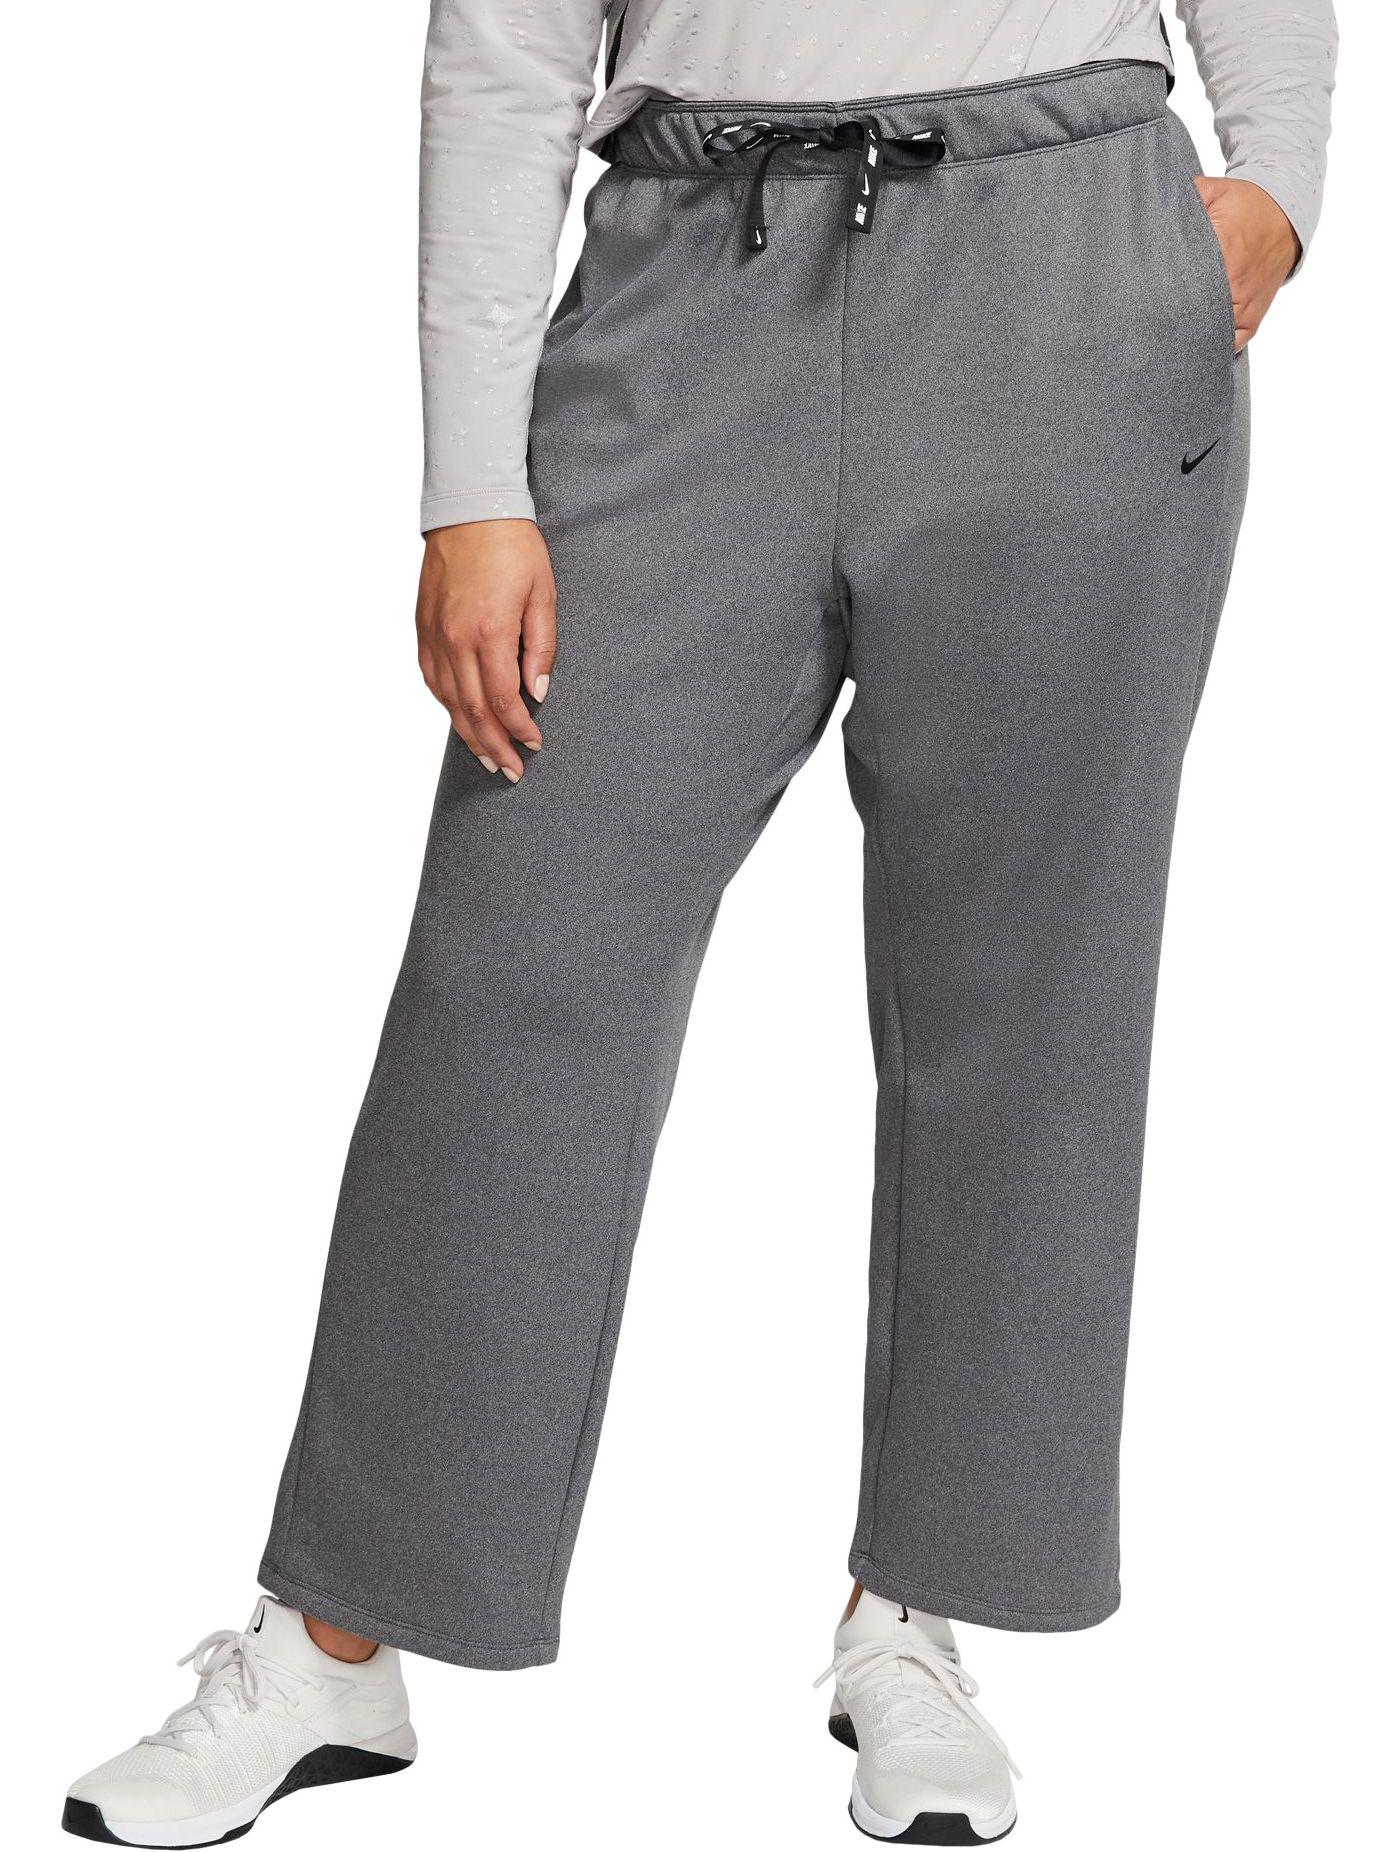 Nike Women's Plus Size Fleece Therma Training Pants